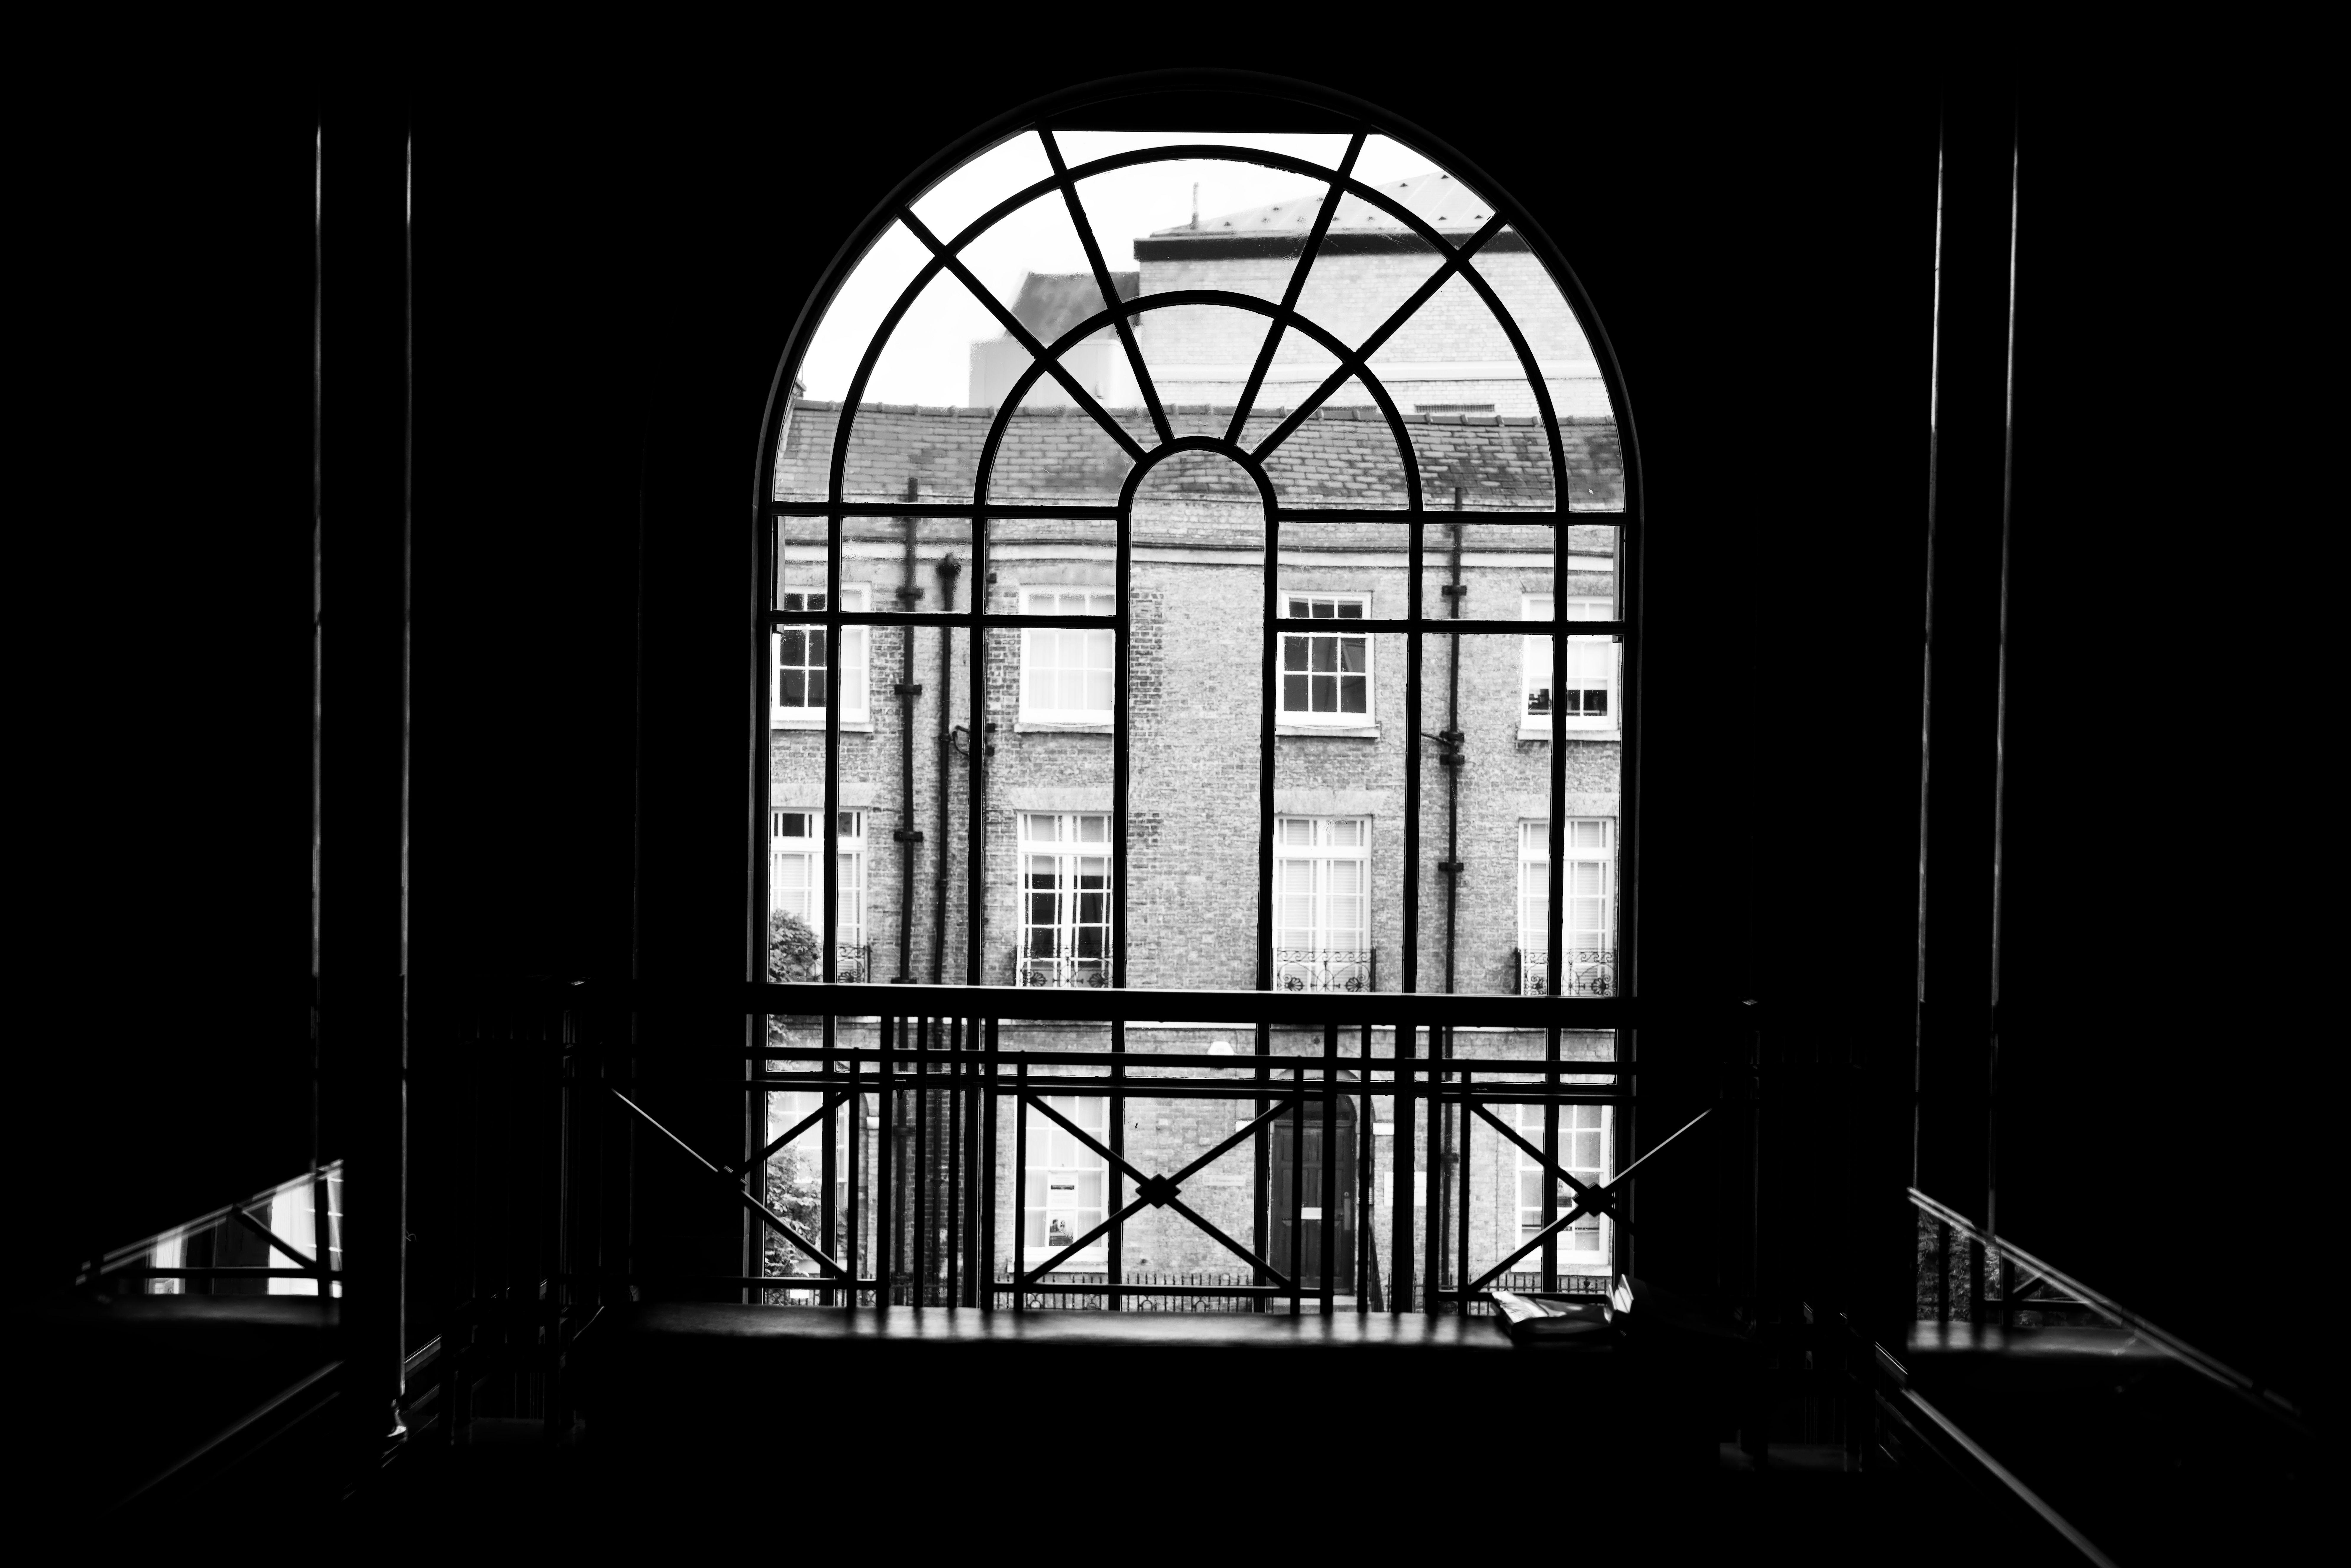 Fitzwilliam window